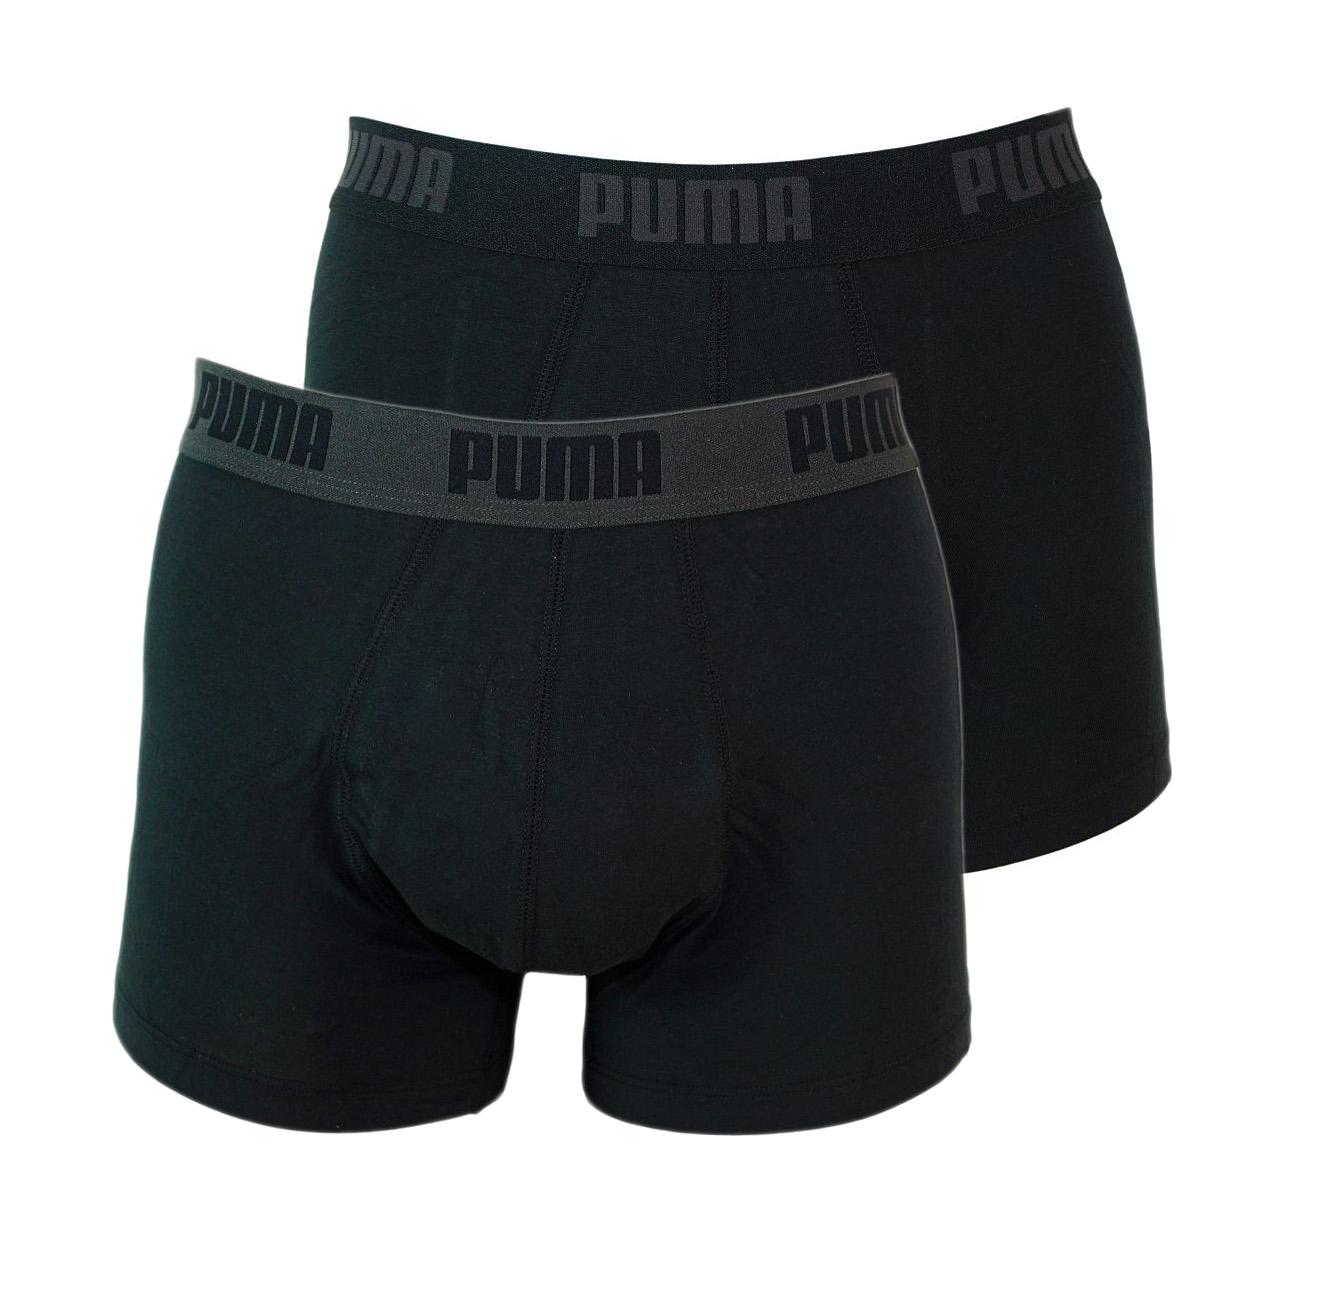 PUMA Shorts Unterhosen 2er Pack Trunk 521025001 230 020 black SF17-PMS1